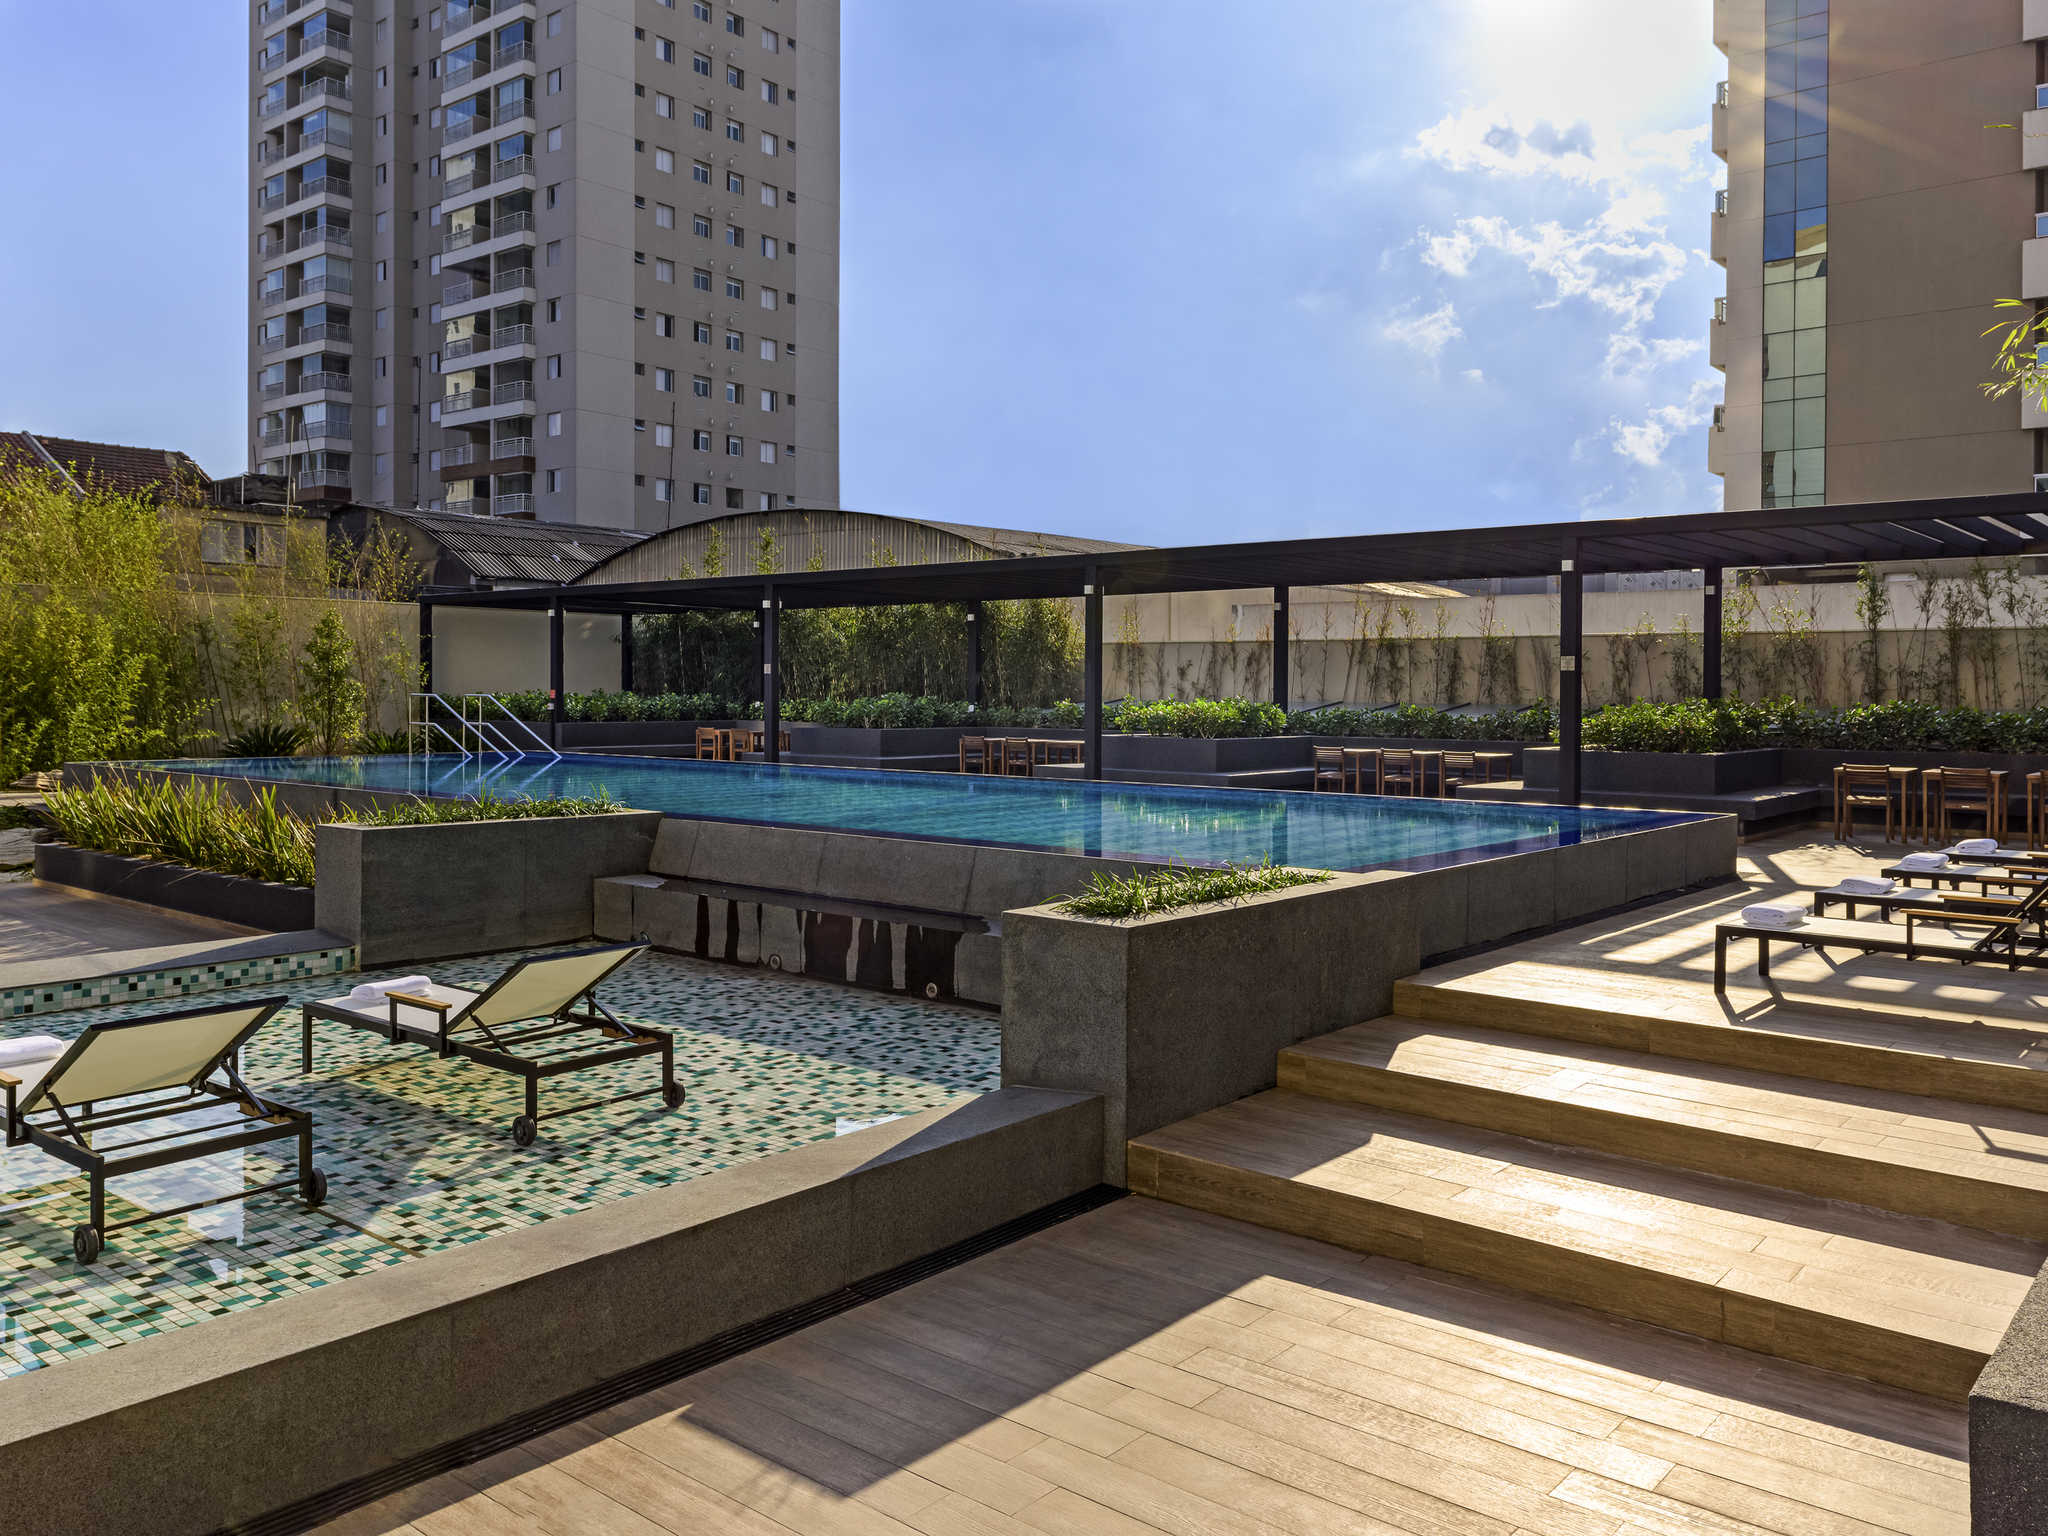 Hotell – Aparthotel Adagio São Paulo Barra Funda